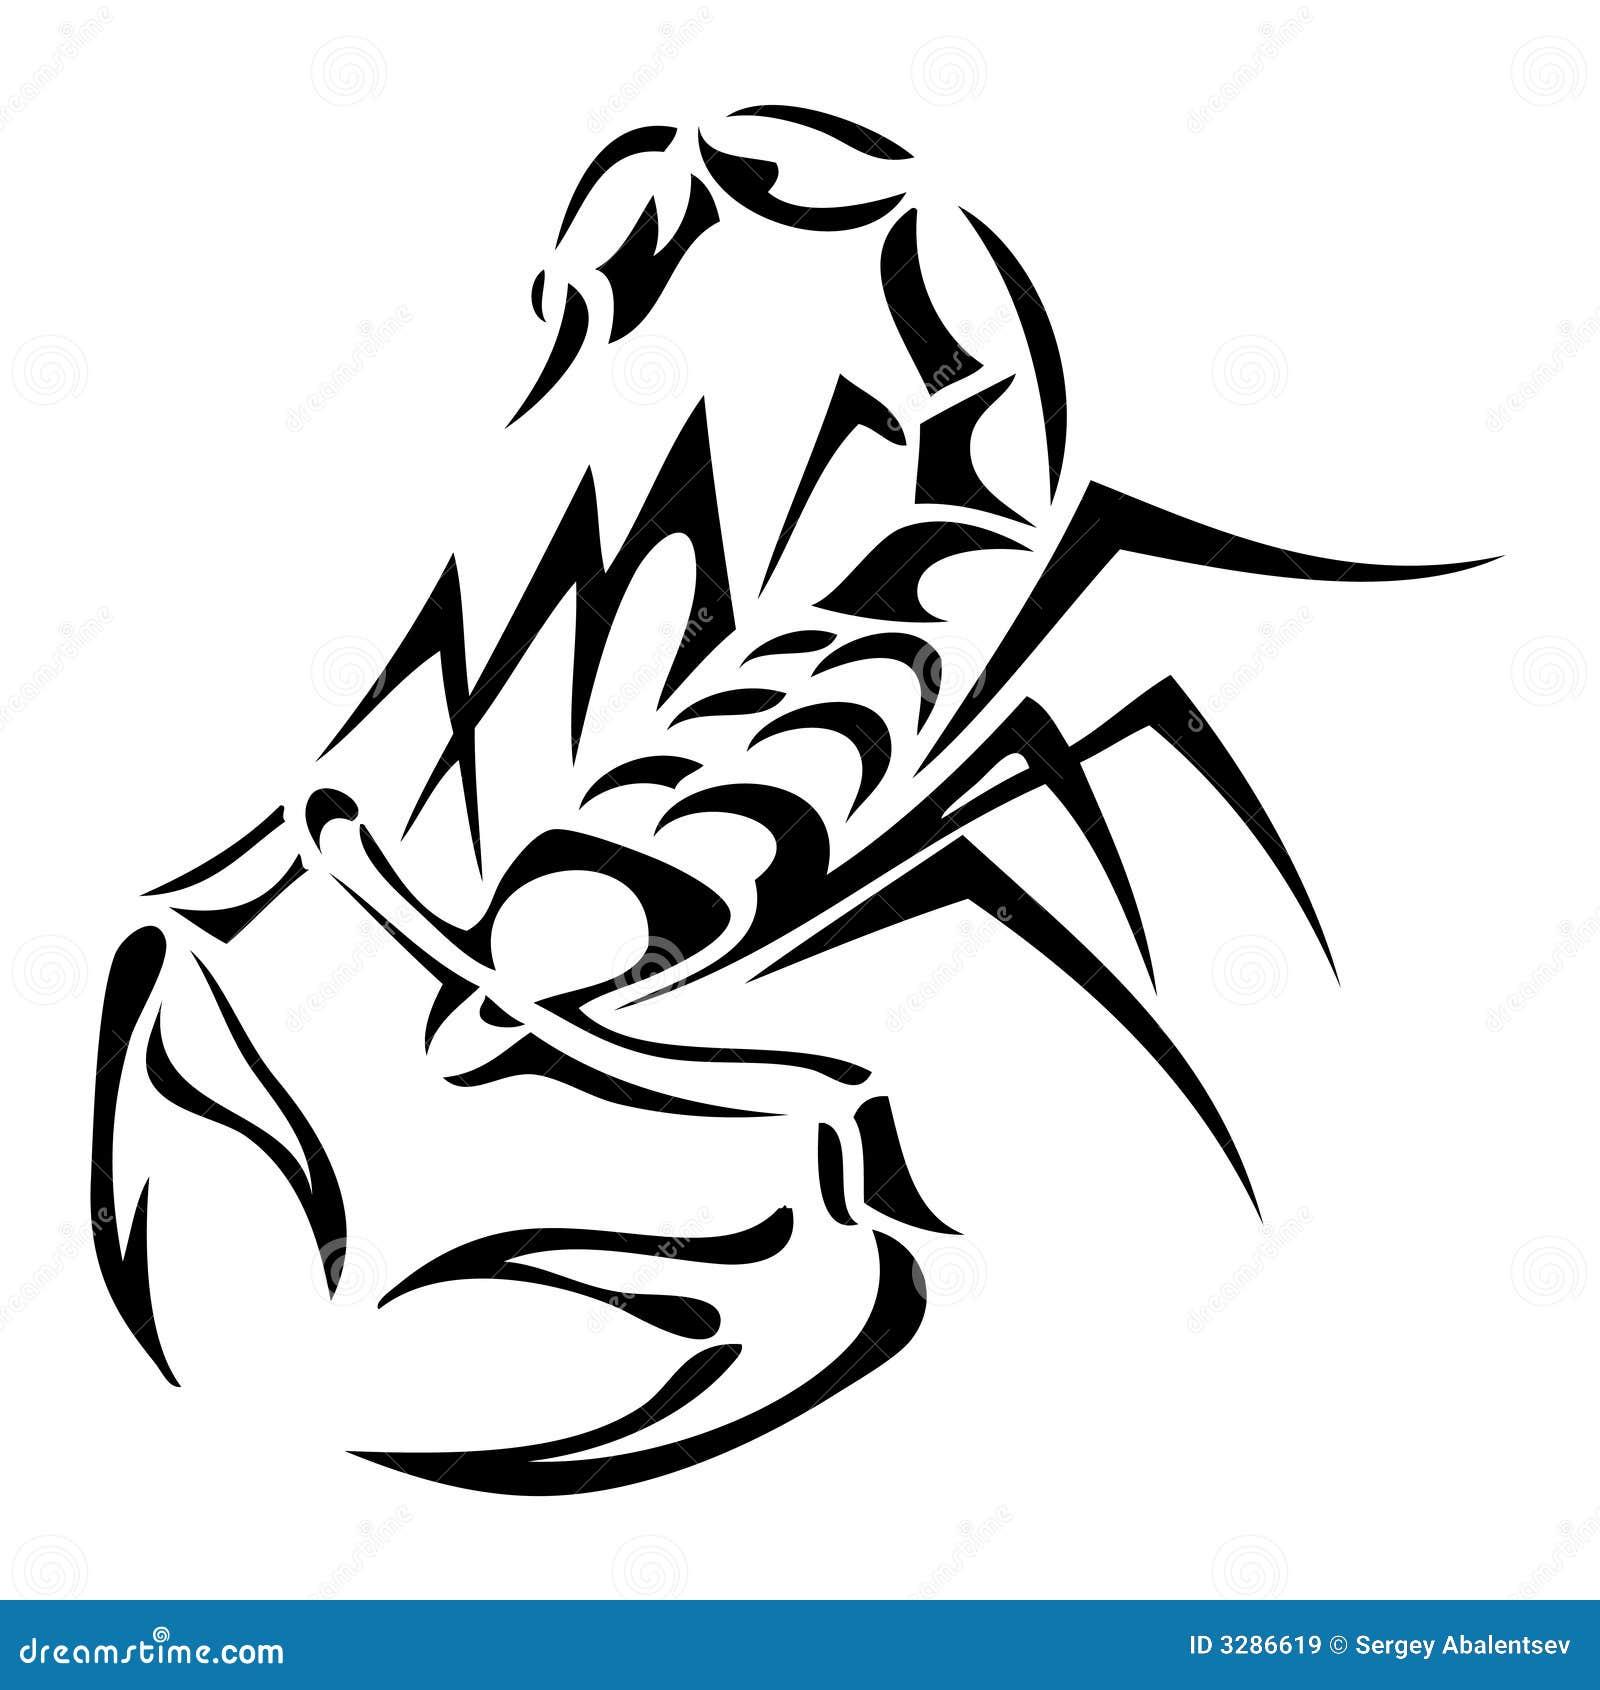 scorpion tatoo stock vector illustration of culture tattoo 3286619. Black Bedroom Furniture Sets. Home Design Ideas